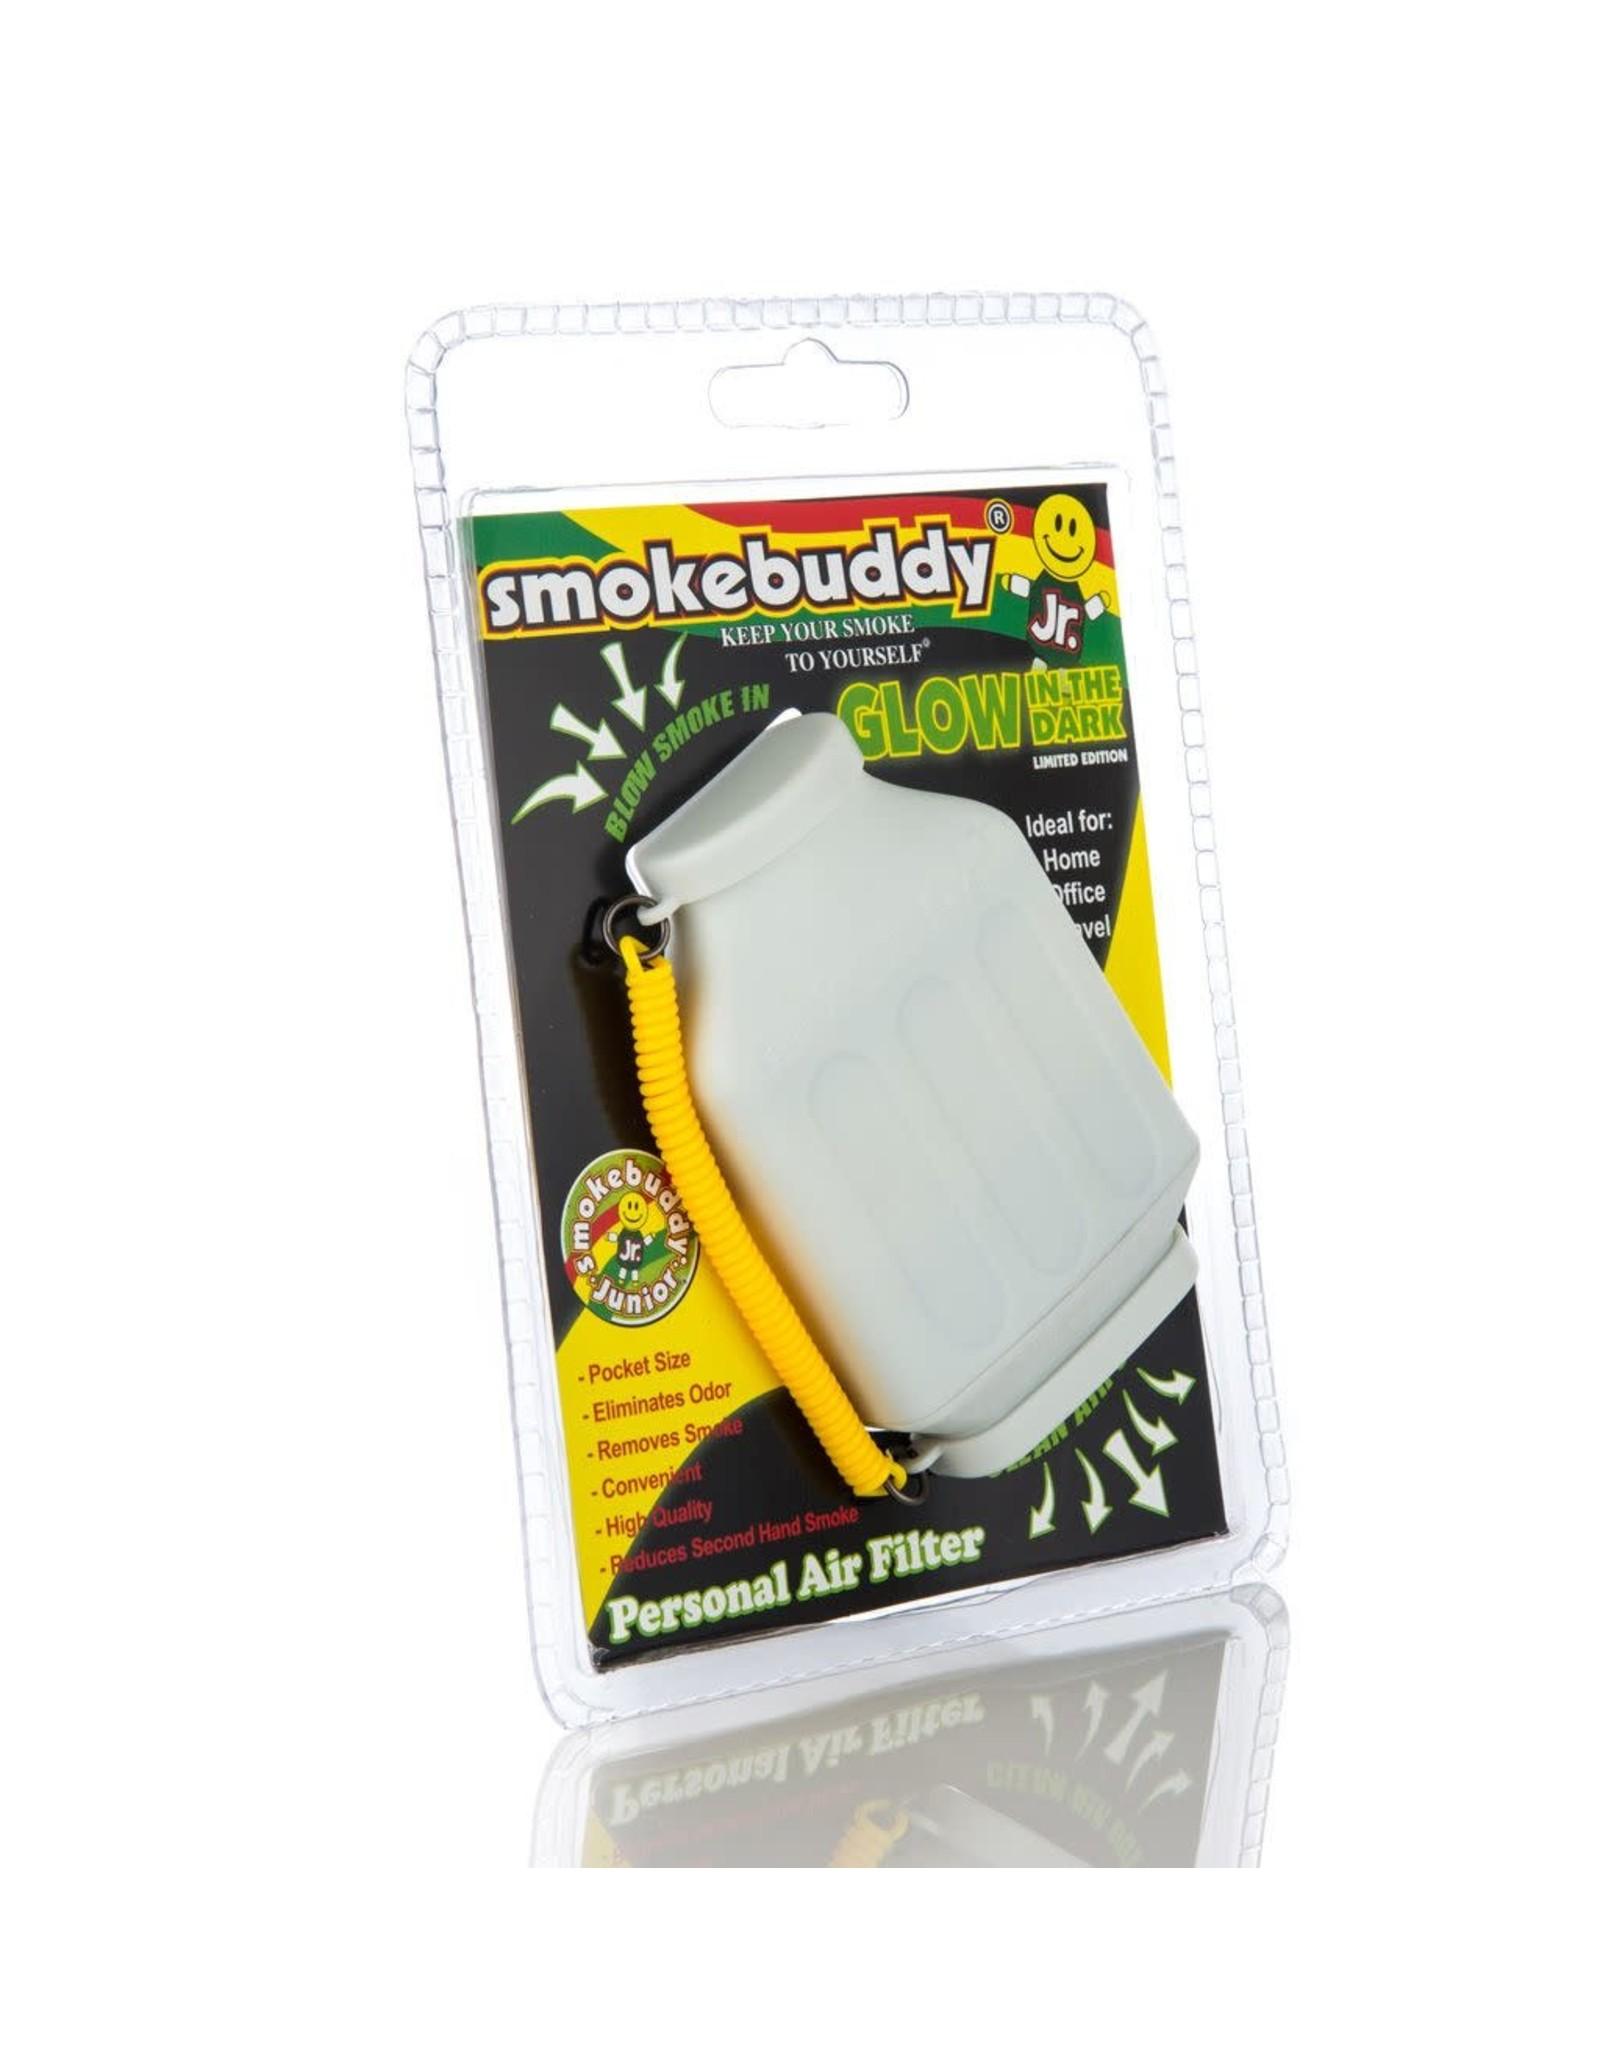 smoke buddy White Glow in The Dark Smokebuddy Junior Personal Air Filter